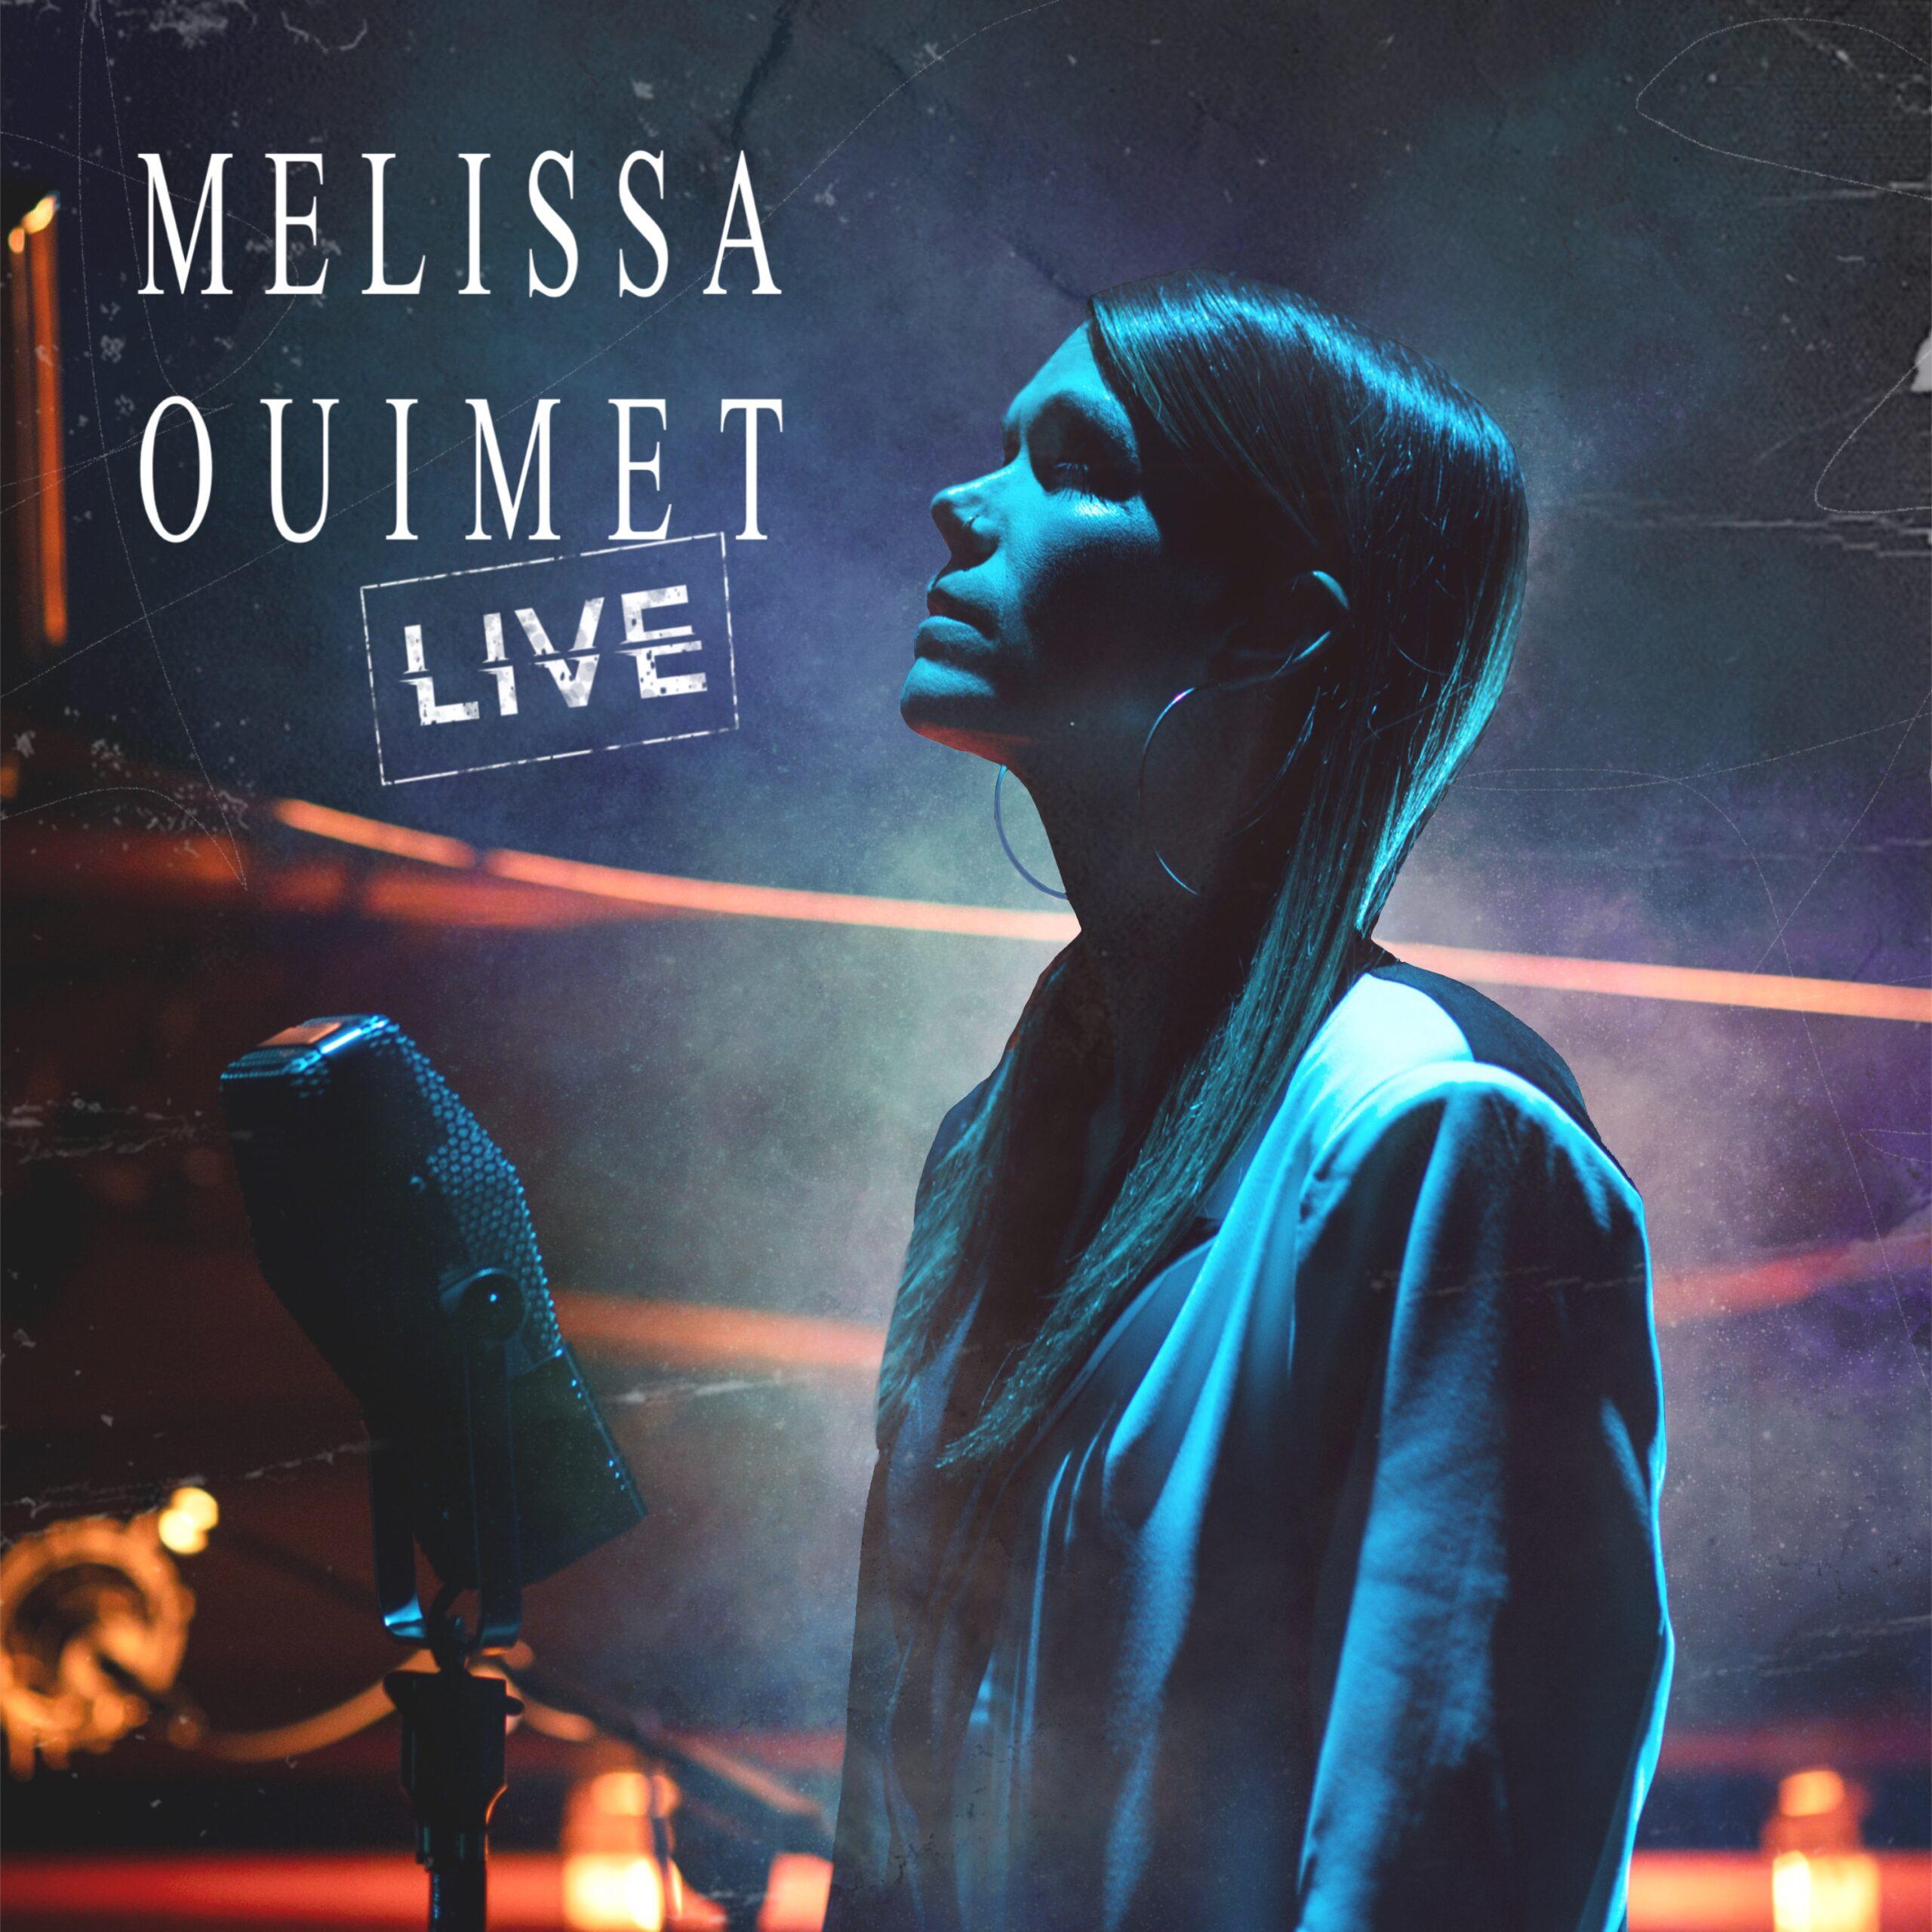 Melissa Ouimet live